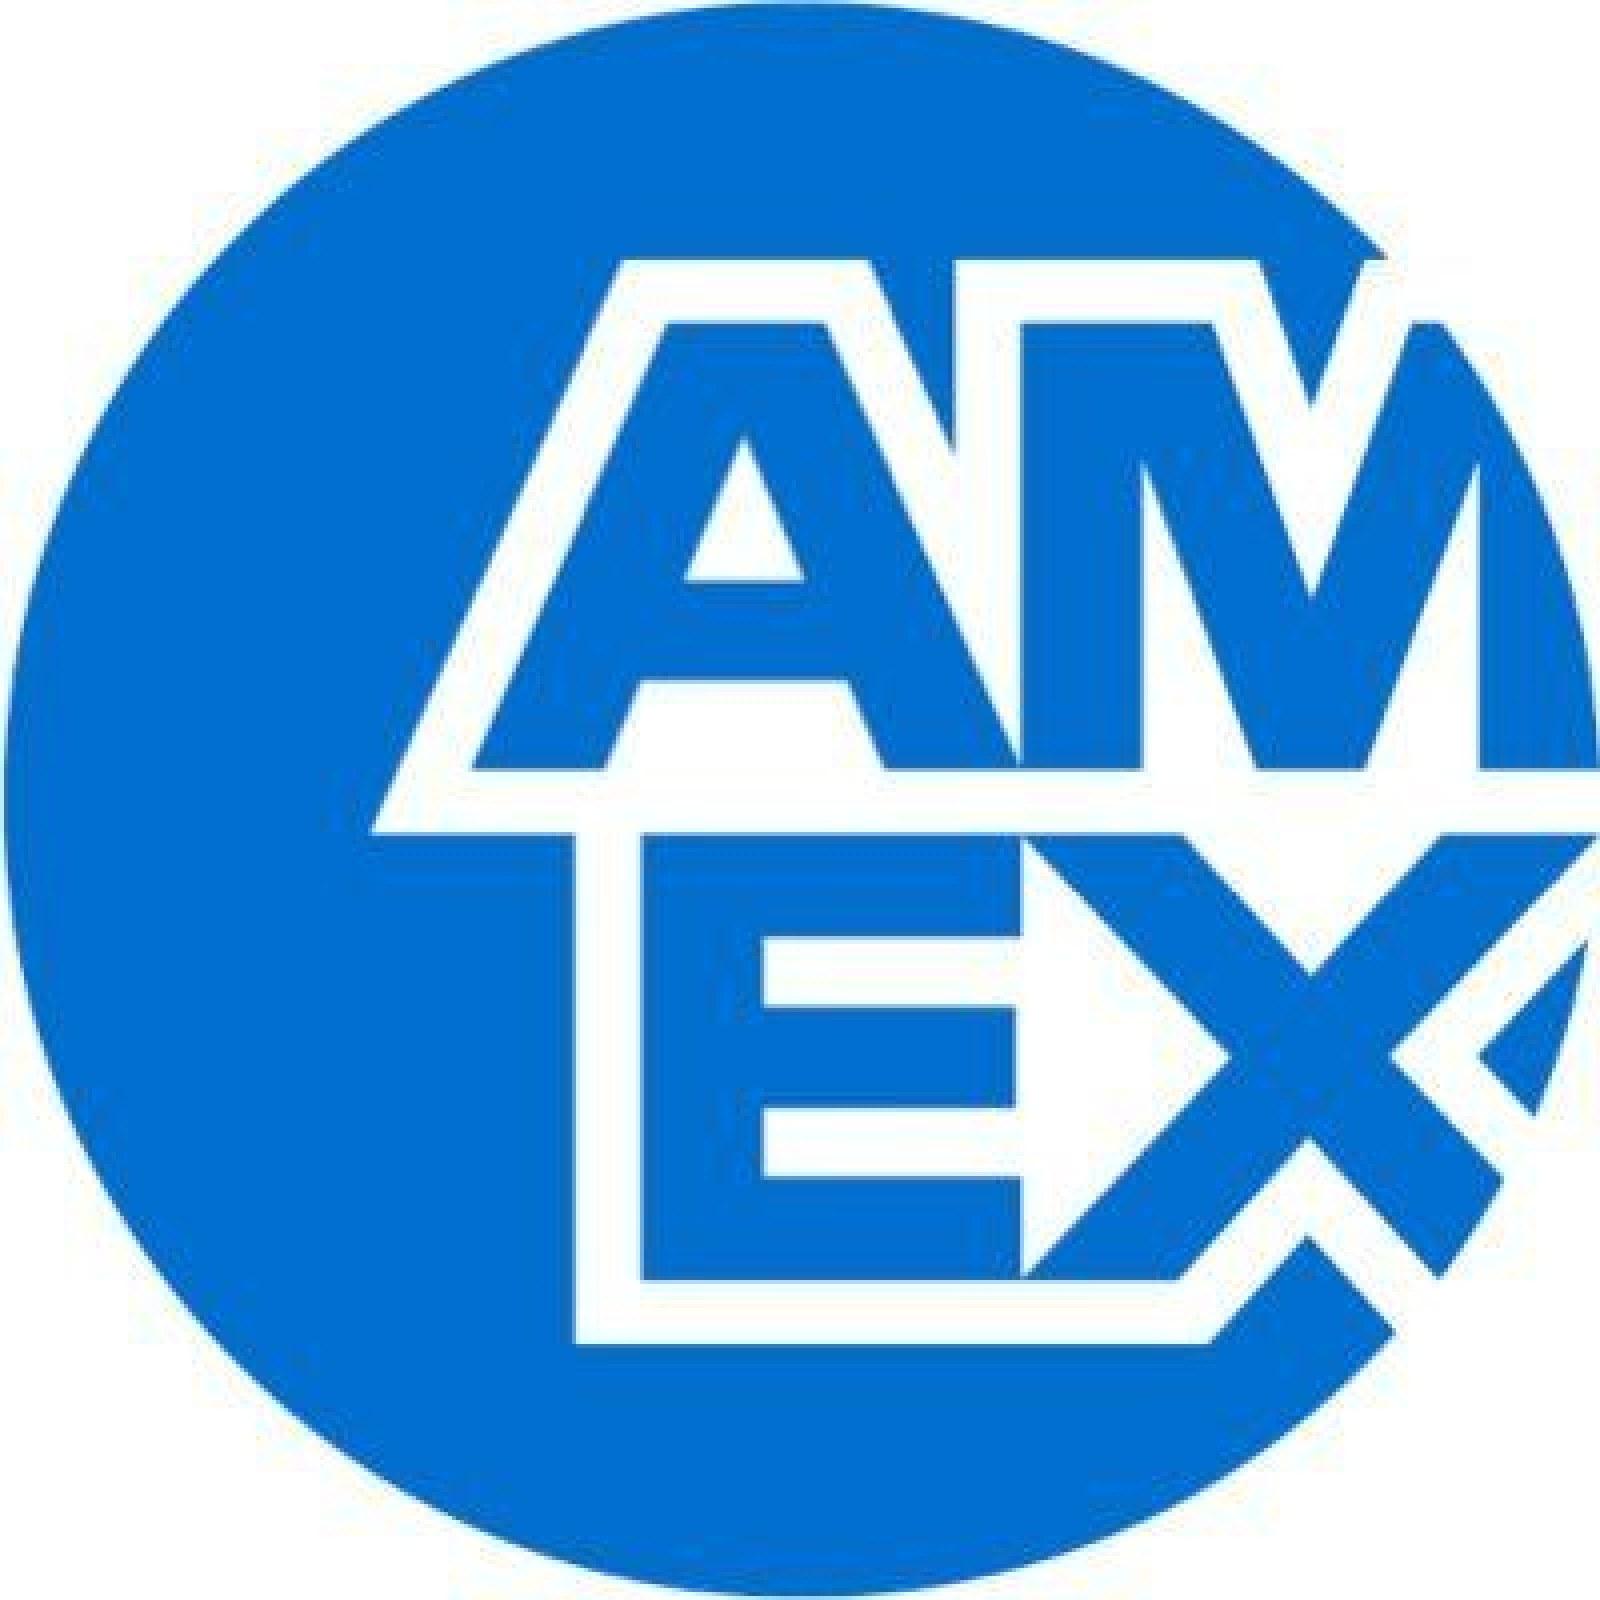 Www xvidvideocodecs com american express log